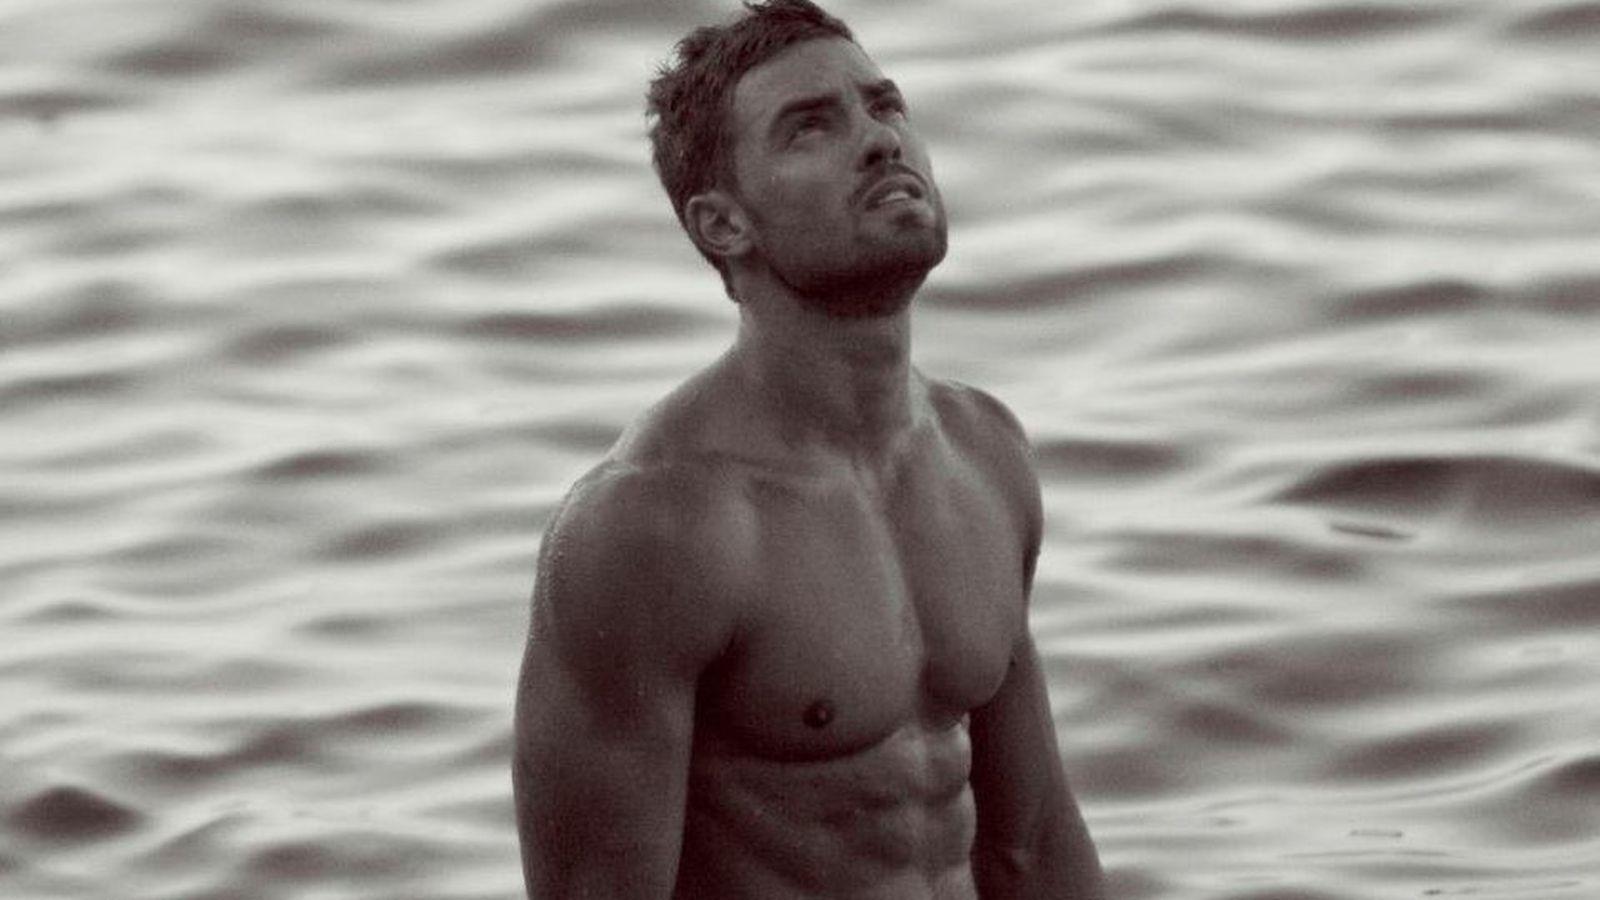 gay swim suit